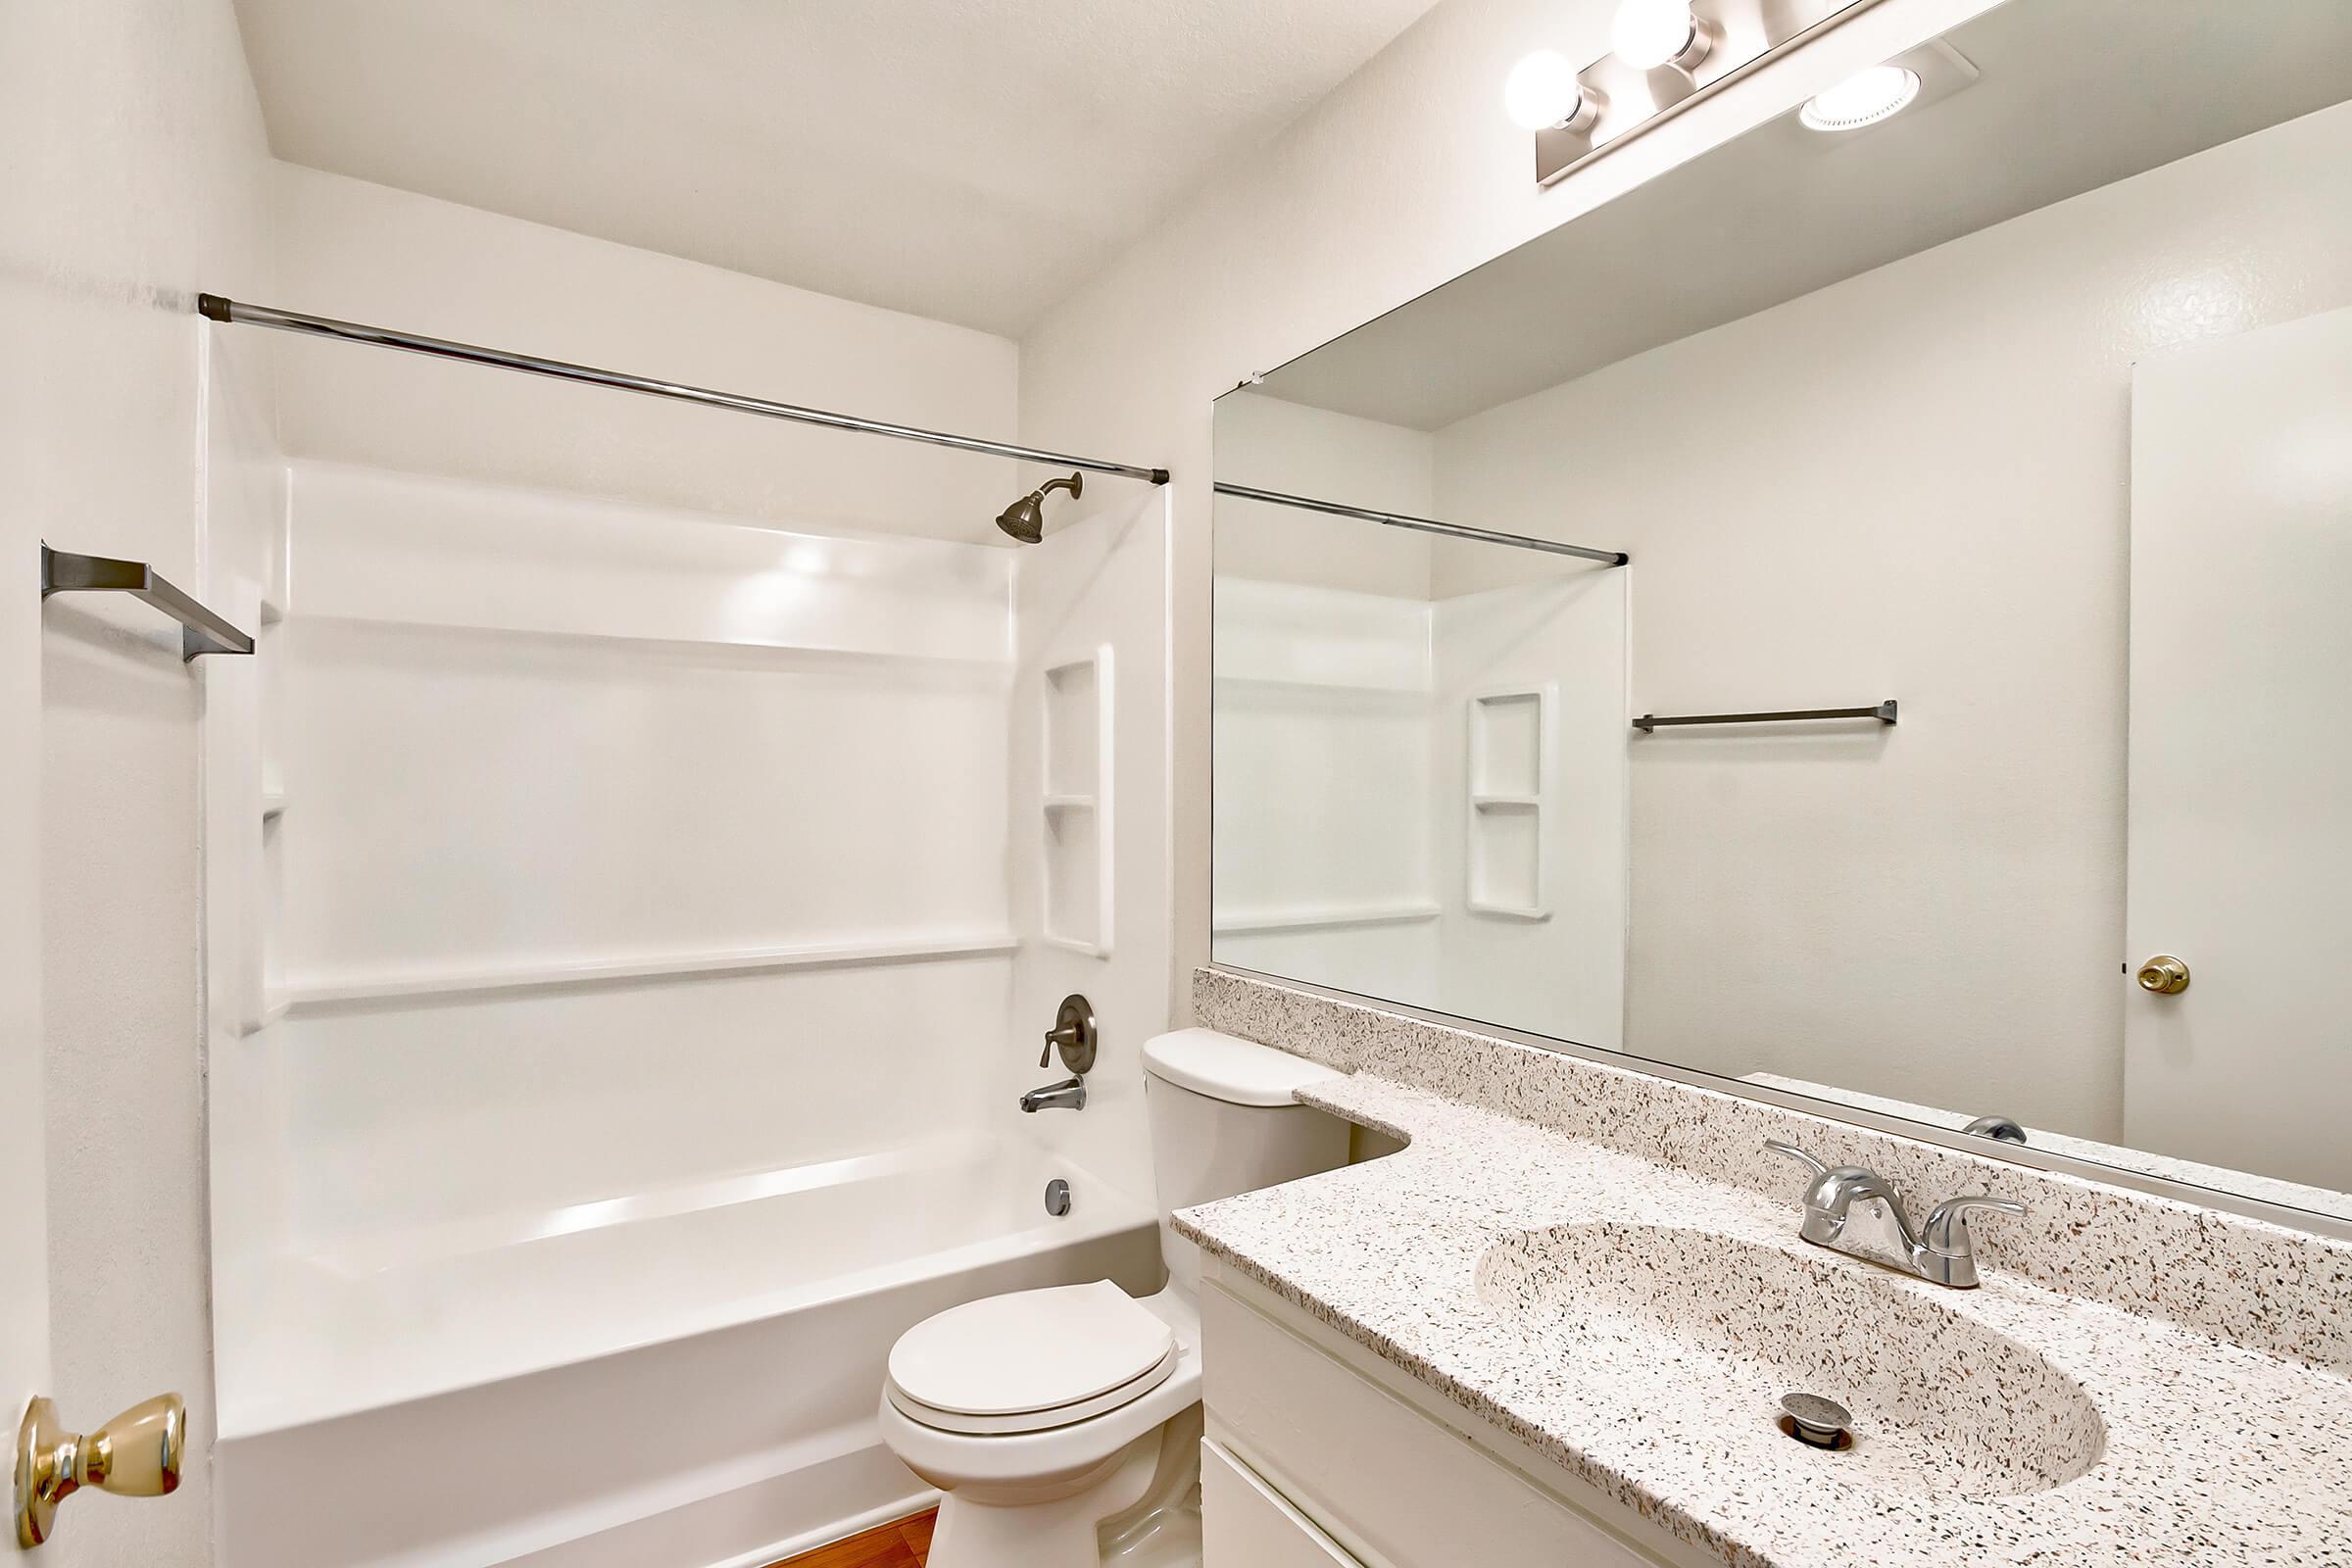 Bathroom_575-W-19Th-St-Costa-Mesa-CA_Park-Center-Place_RPI_II-280960-56.jpg